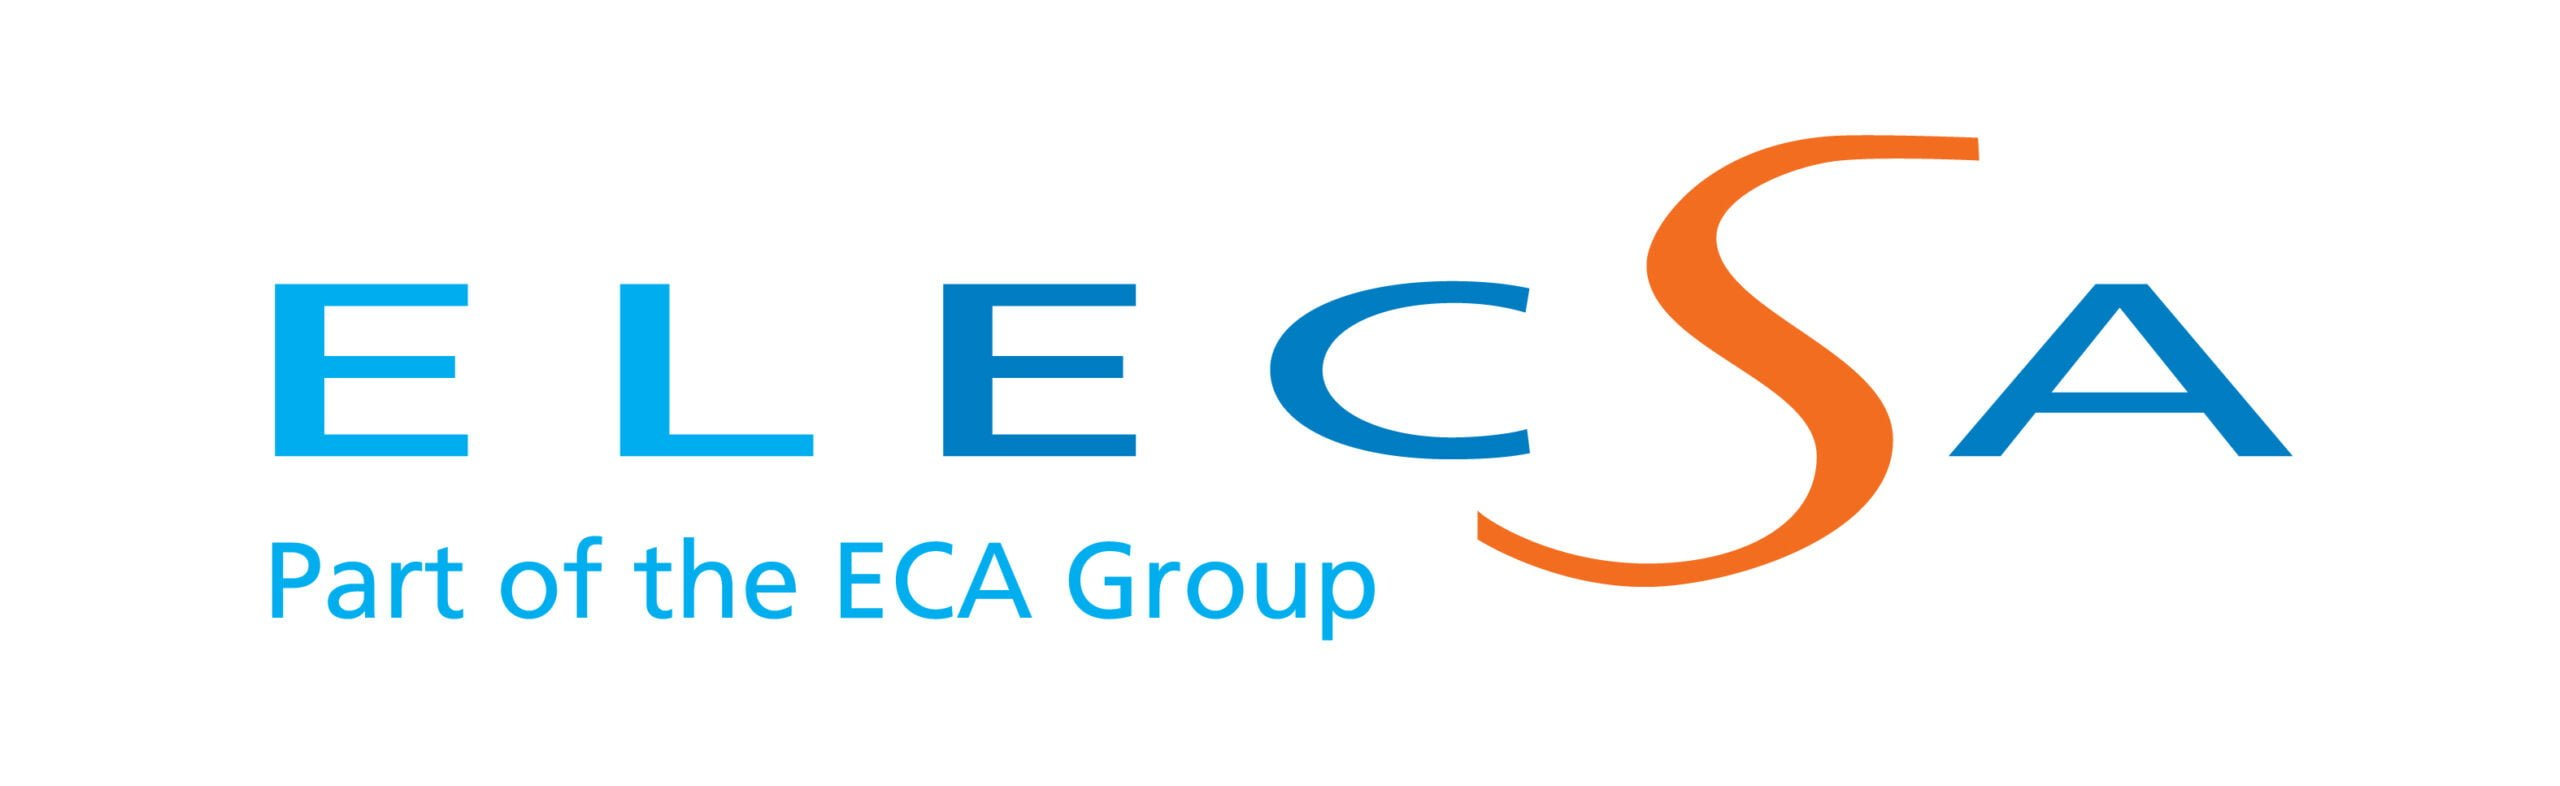 """Elecsa Part of the ECA Group"", Elecsa logo, Linn electrical Contractors Ltd, Trowbridge, Wiltshire"